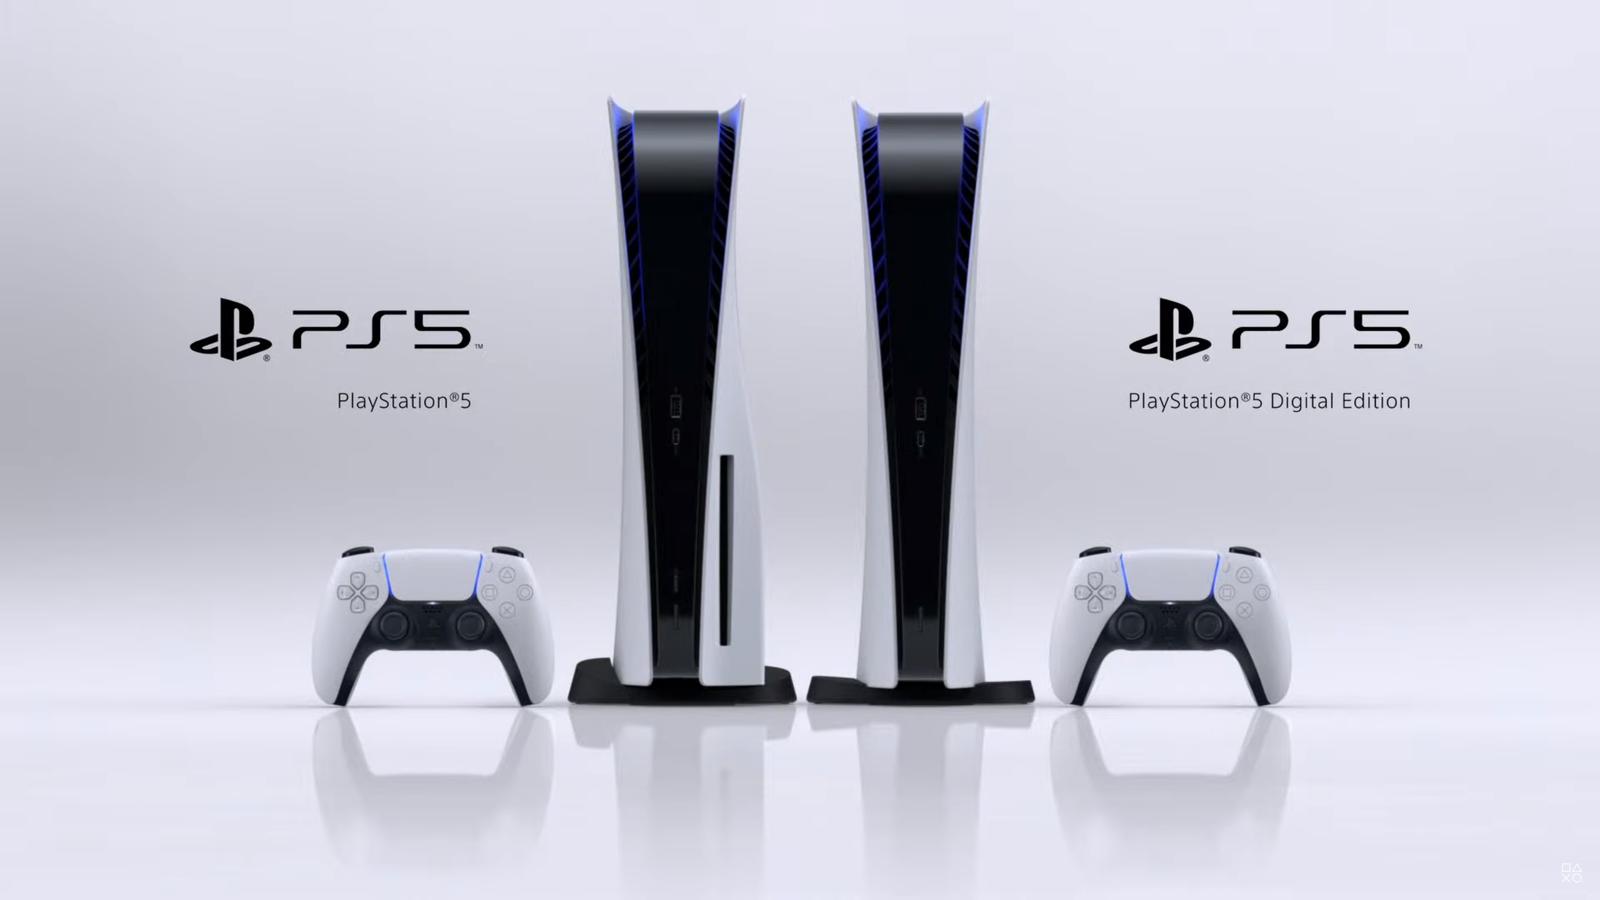 Dette er PS4-spillene du ikke kan spille på PS5